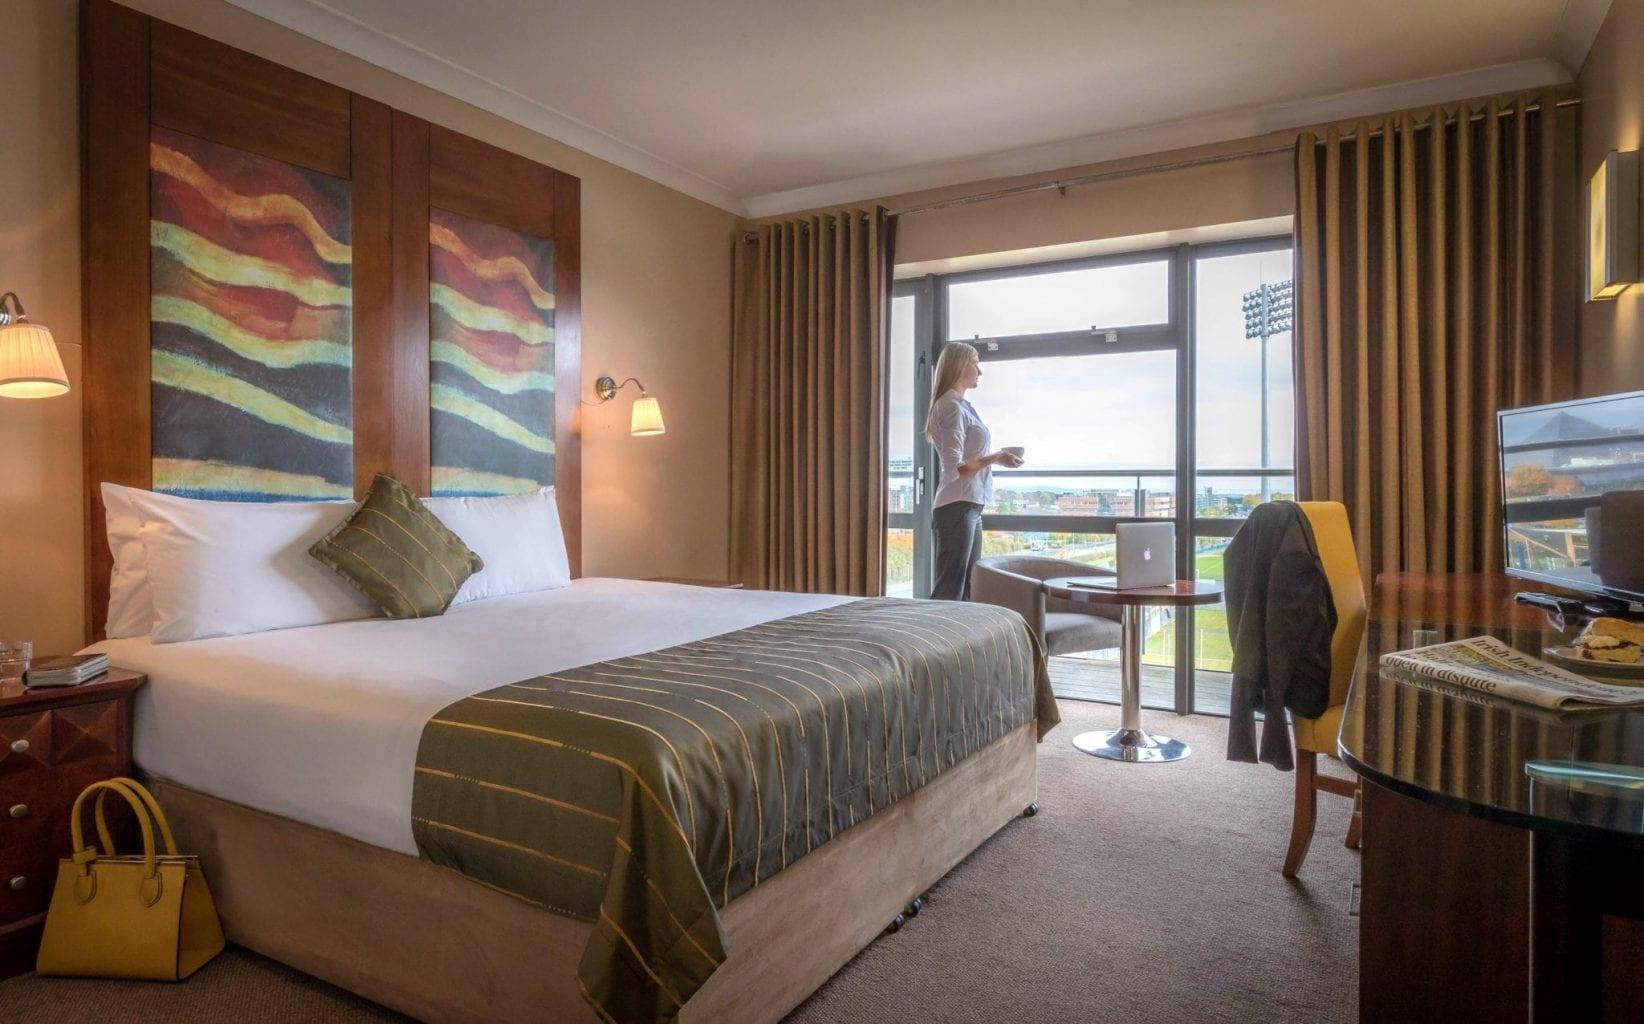 Maldron Hotel Tallaght Double Room